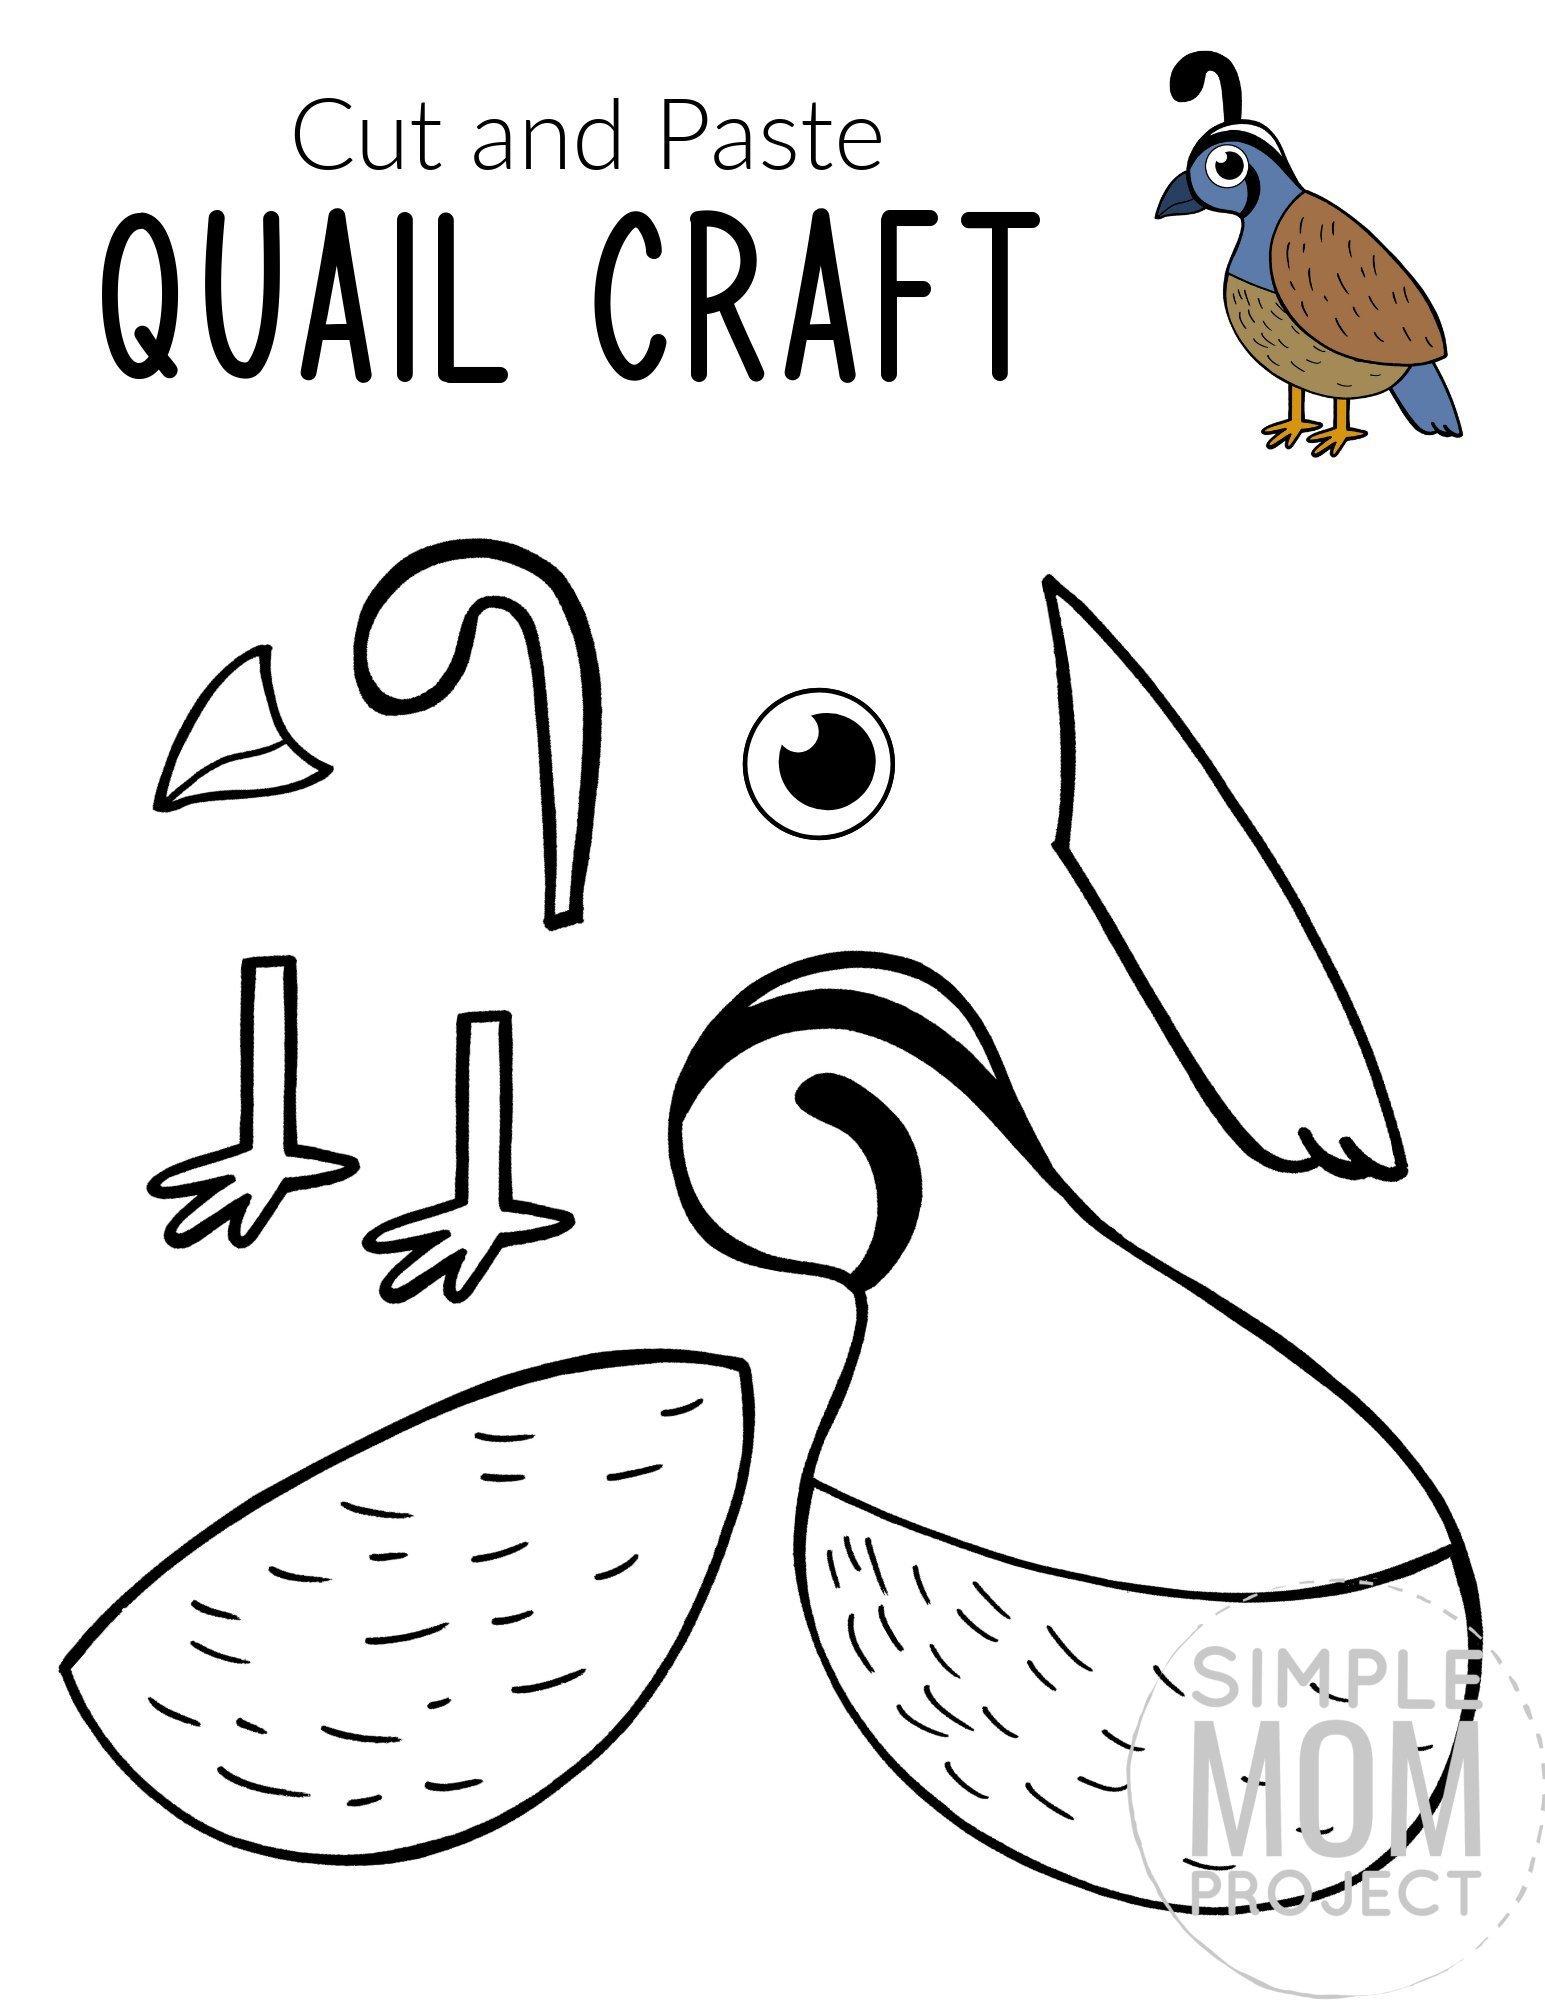 Printable Quail Craft for Kids, preschoolers toddlers and kindergartners